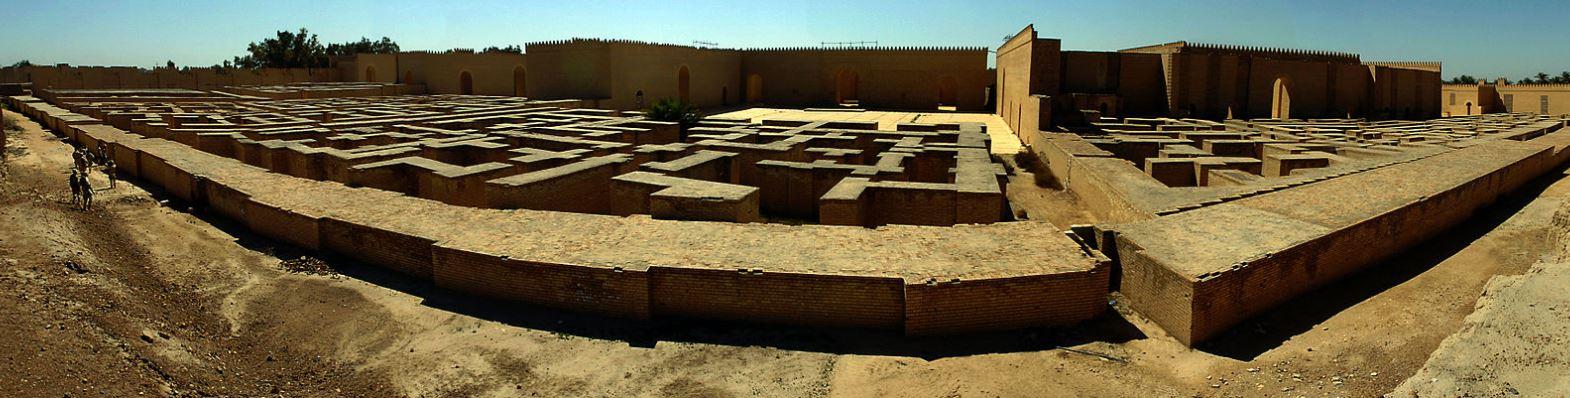 babylon world heritage, iraq tourism, ancient civilization, historical city, world heritage list, बेबीलॉन विश्व धरोहर, इराक पर्यटन, पुरानी सभ्यता, ऐतिहासिक शहर, विश्व धरोहर सूची